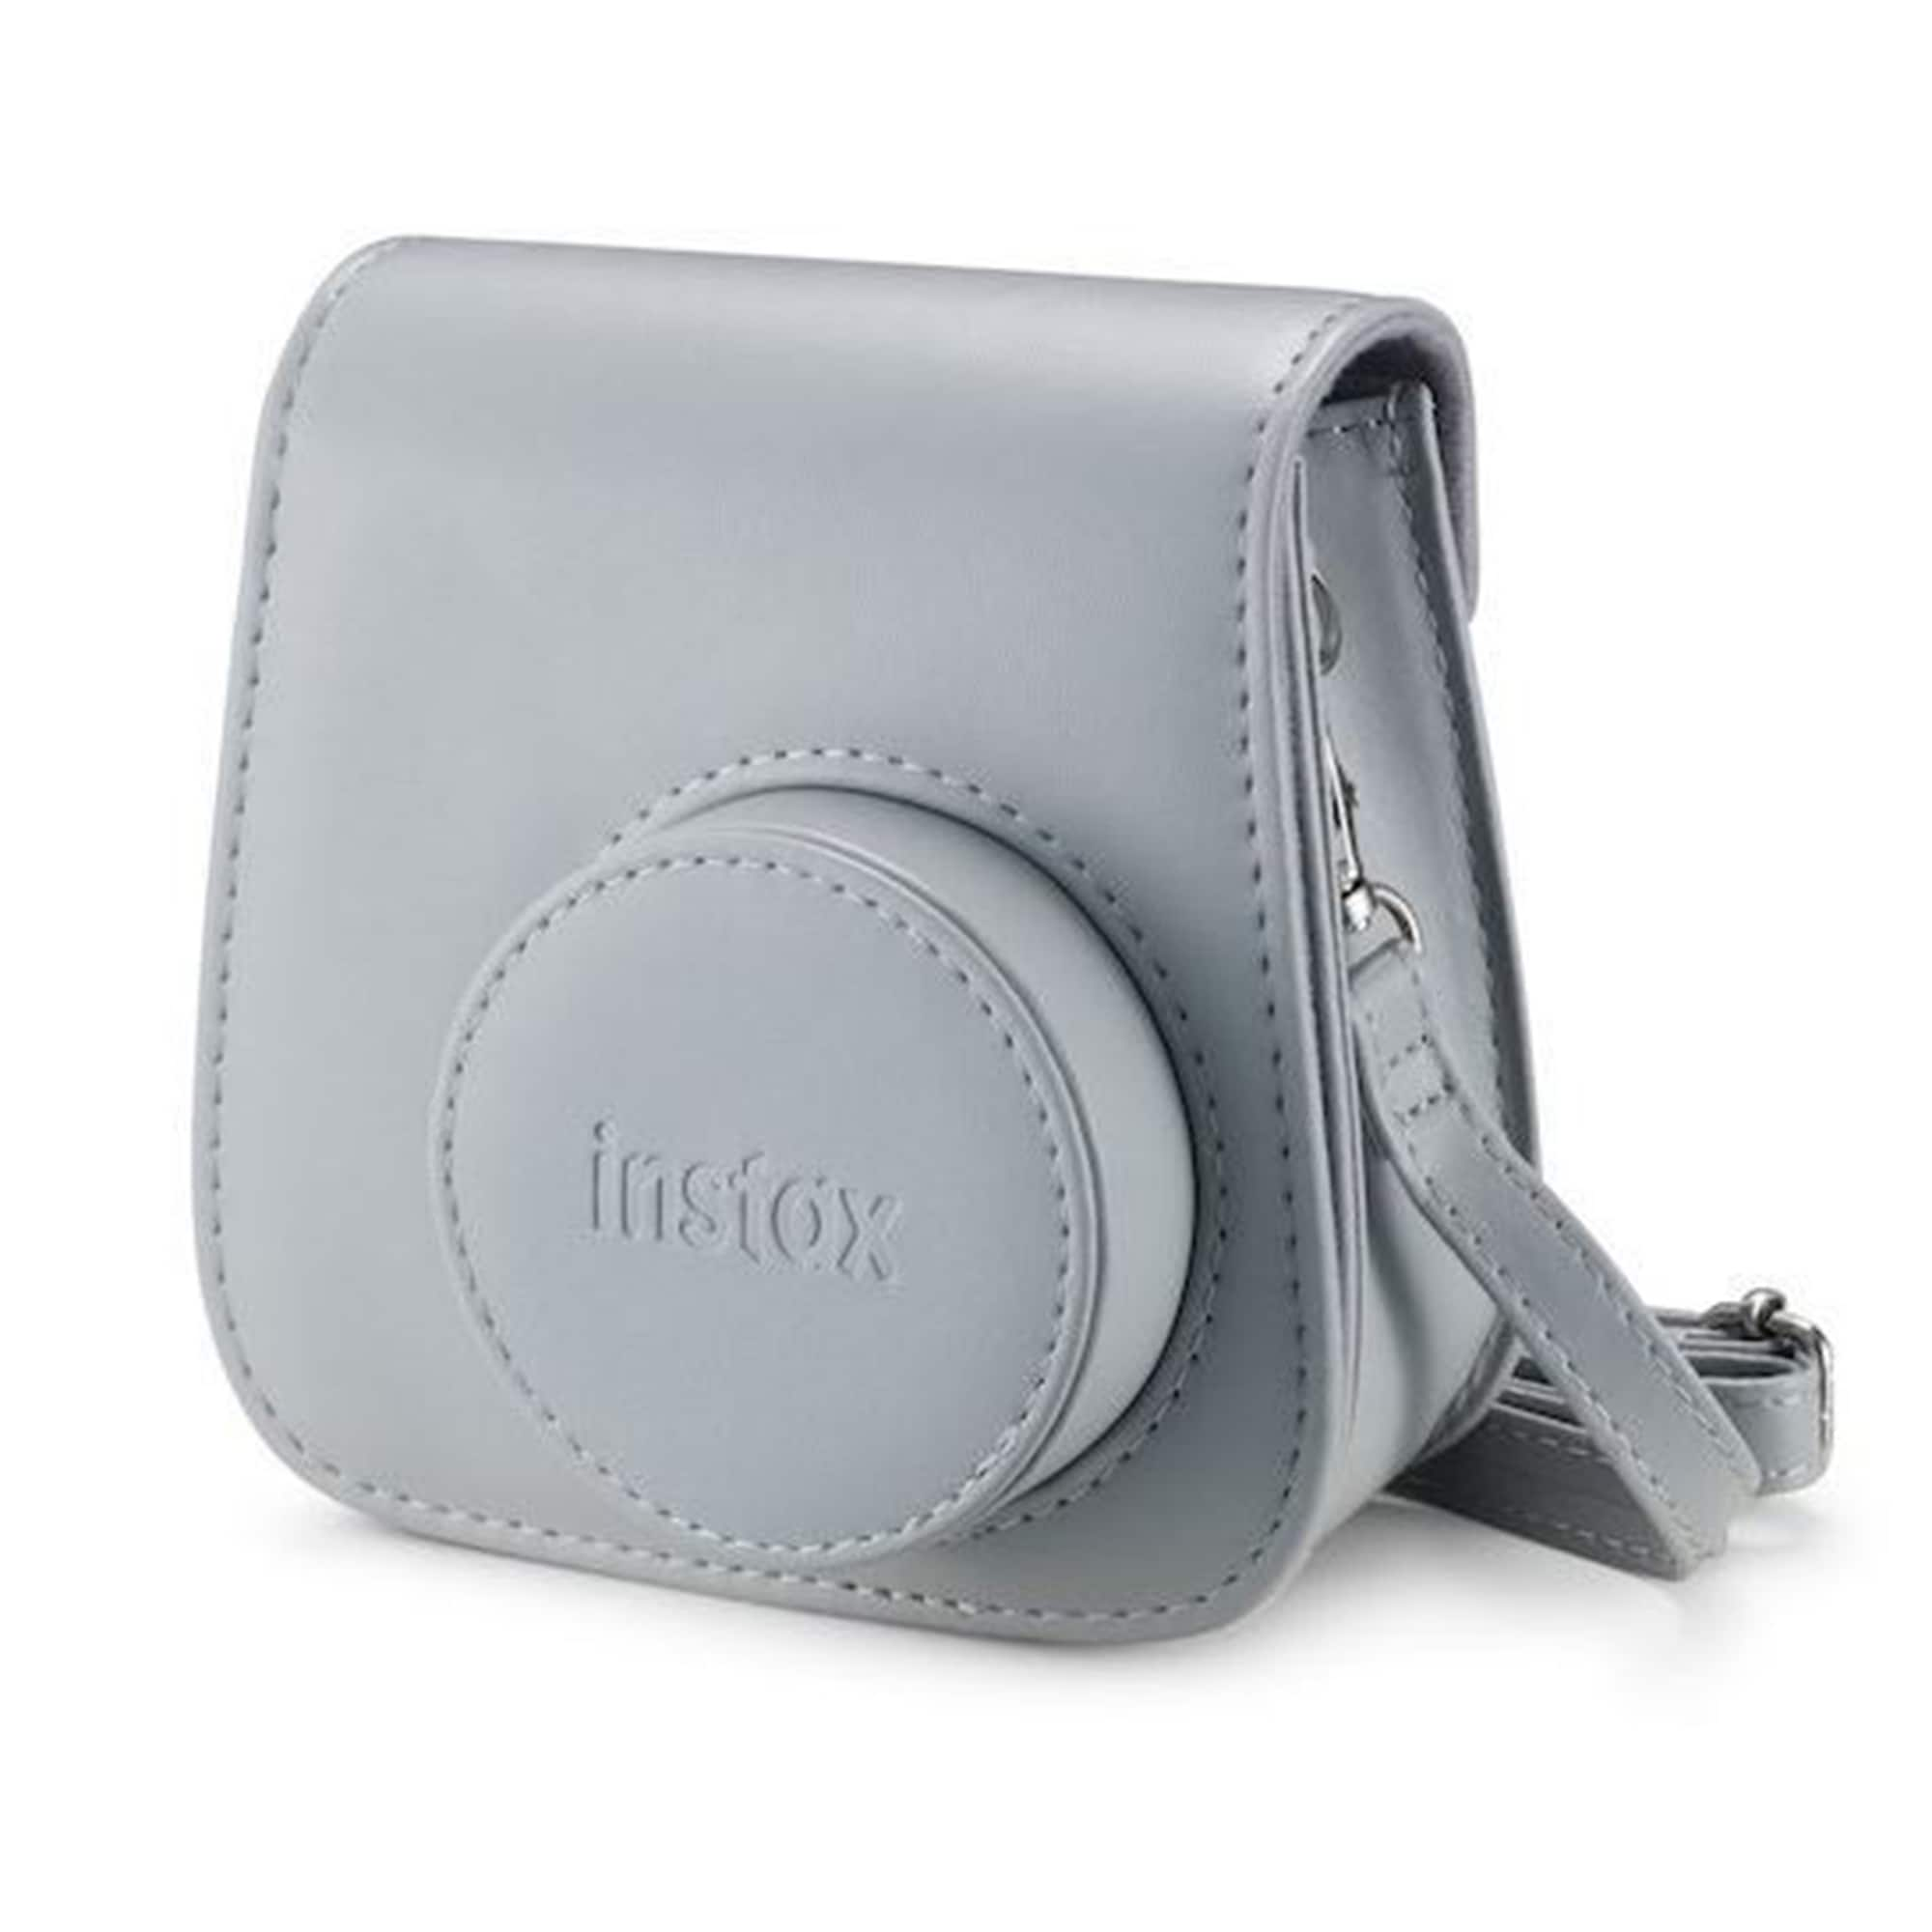 Fujifilm Instax Mini 9 Väska Smokey White